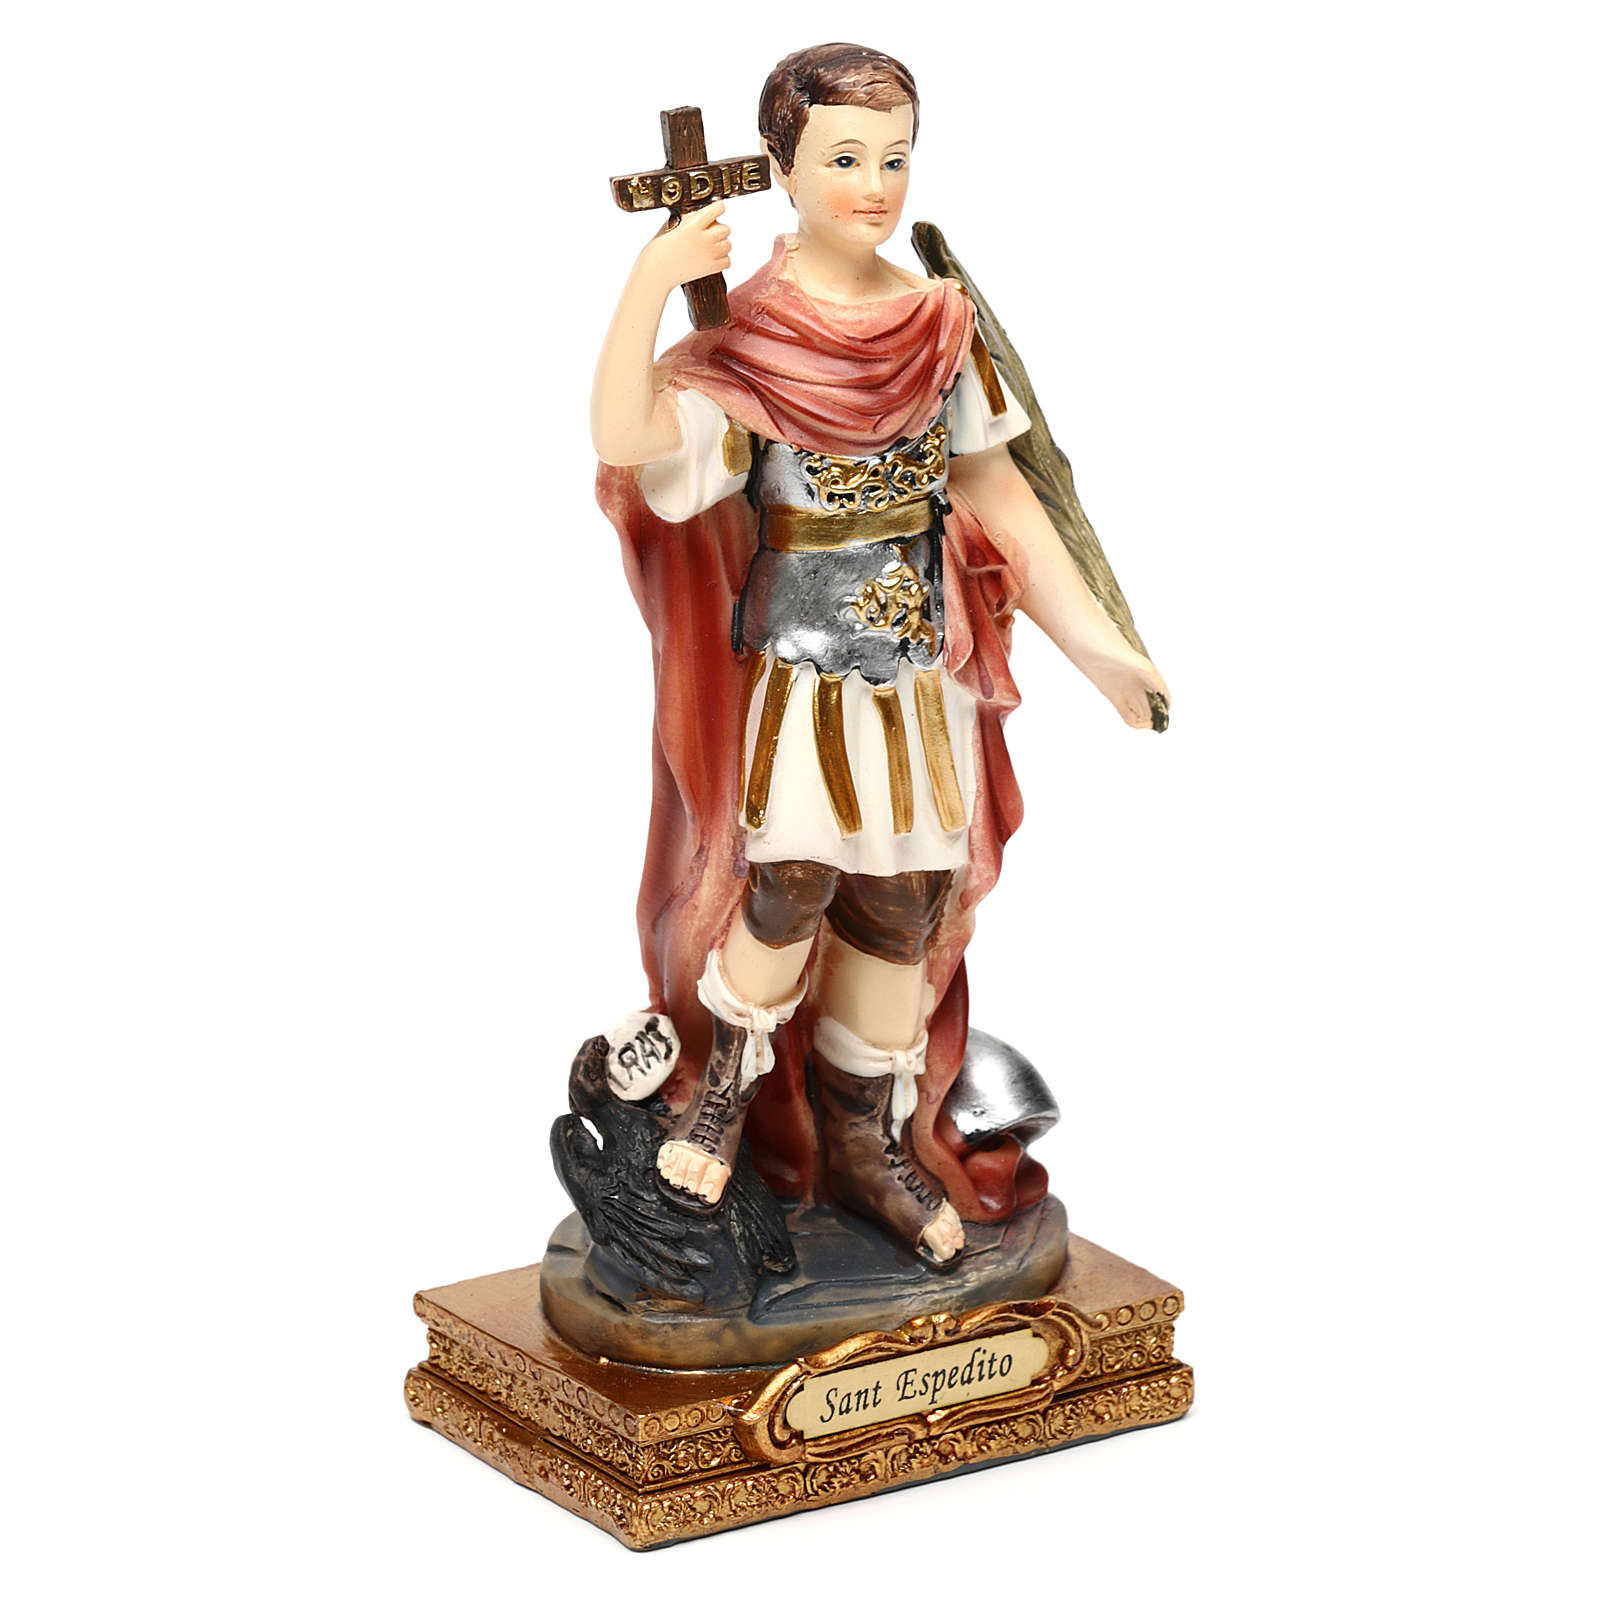 Santo Espedito 14 cm statua resina 4